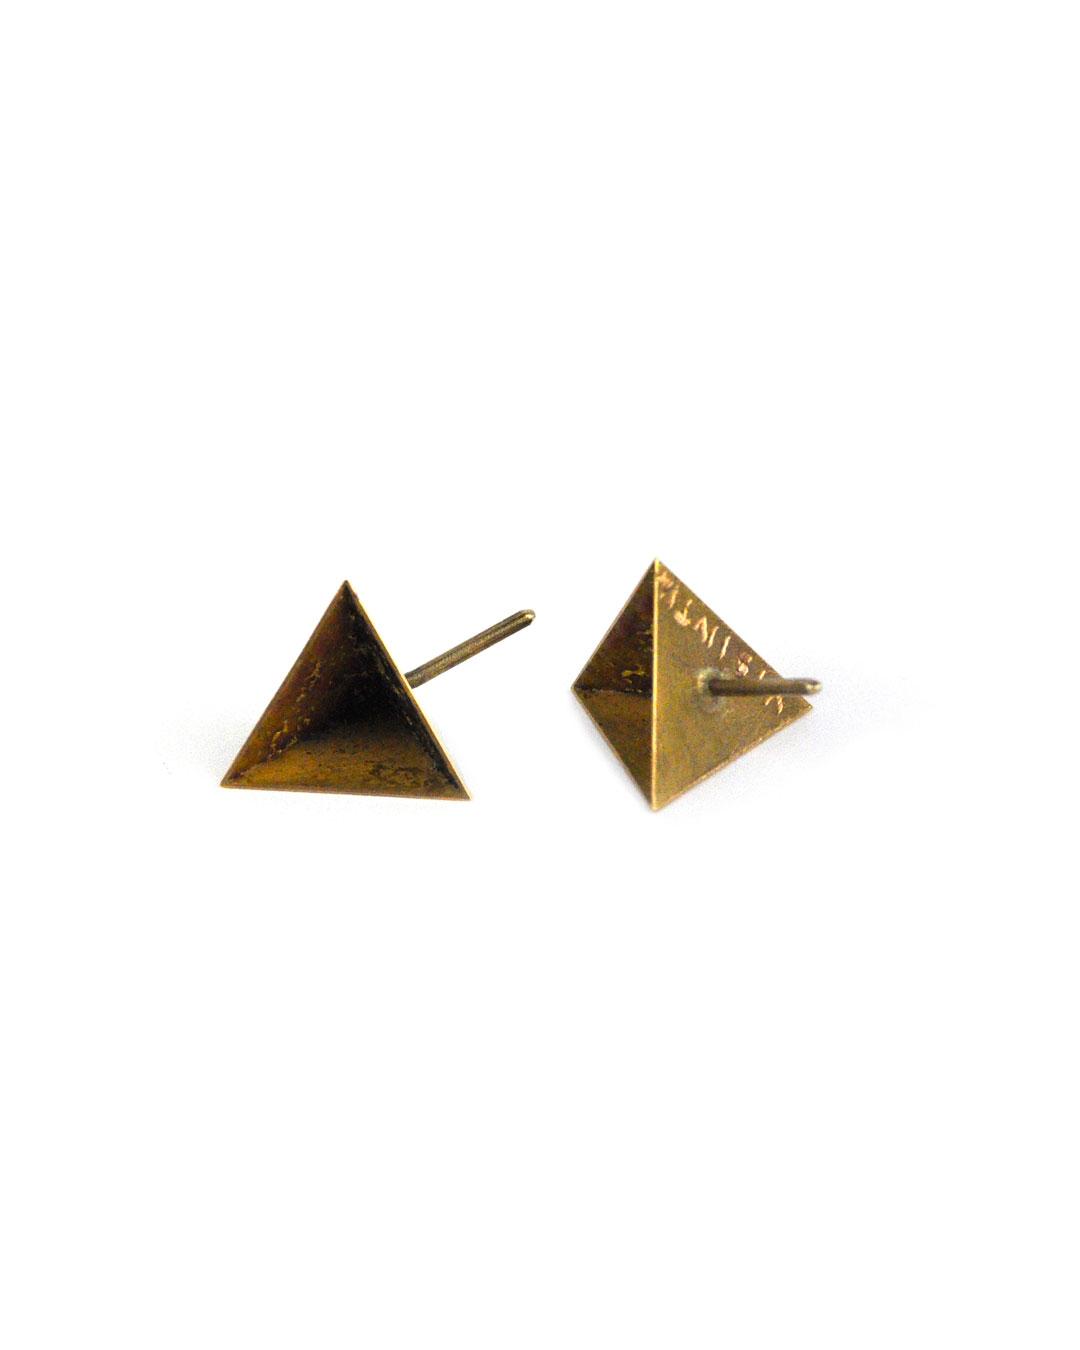 Graziano Visintin, untitled, 2010, earrings; gold, enamel, gold leaf, 7 x 7 x 7 mm, €3630